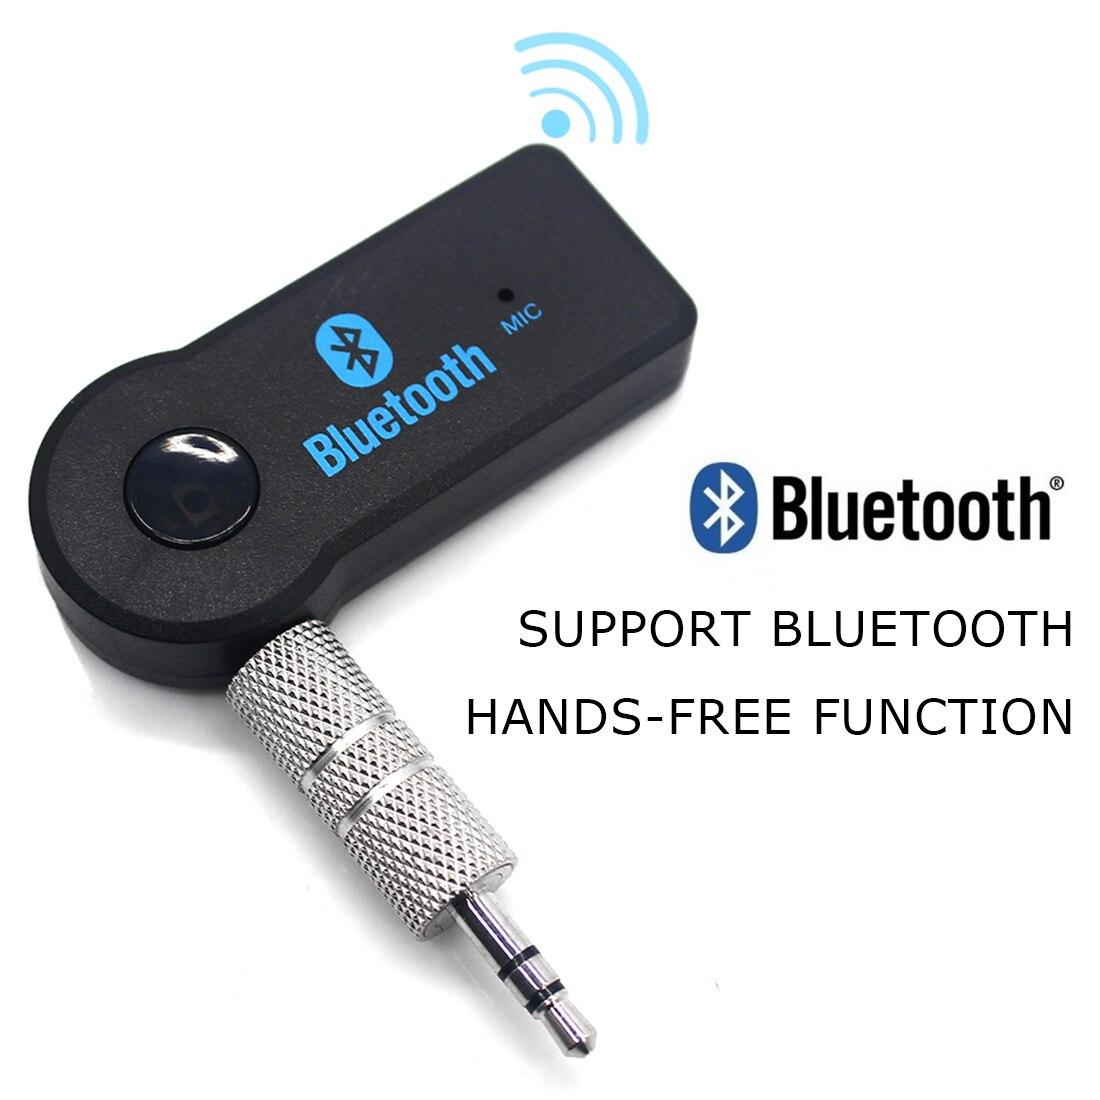 Adaptador de Bluetooth, Dongle USB, receptor de música Bluetooth 3,0 para PC y ordenador, adaptador inalámbrico de Bluetooth Mini transmisor